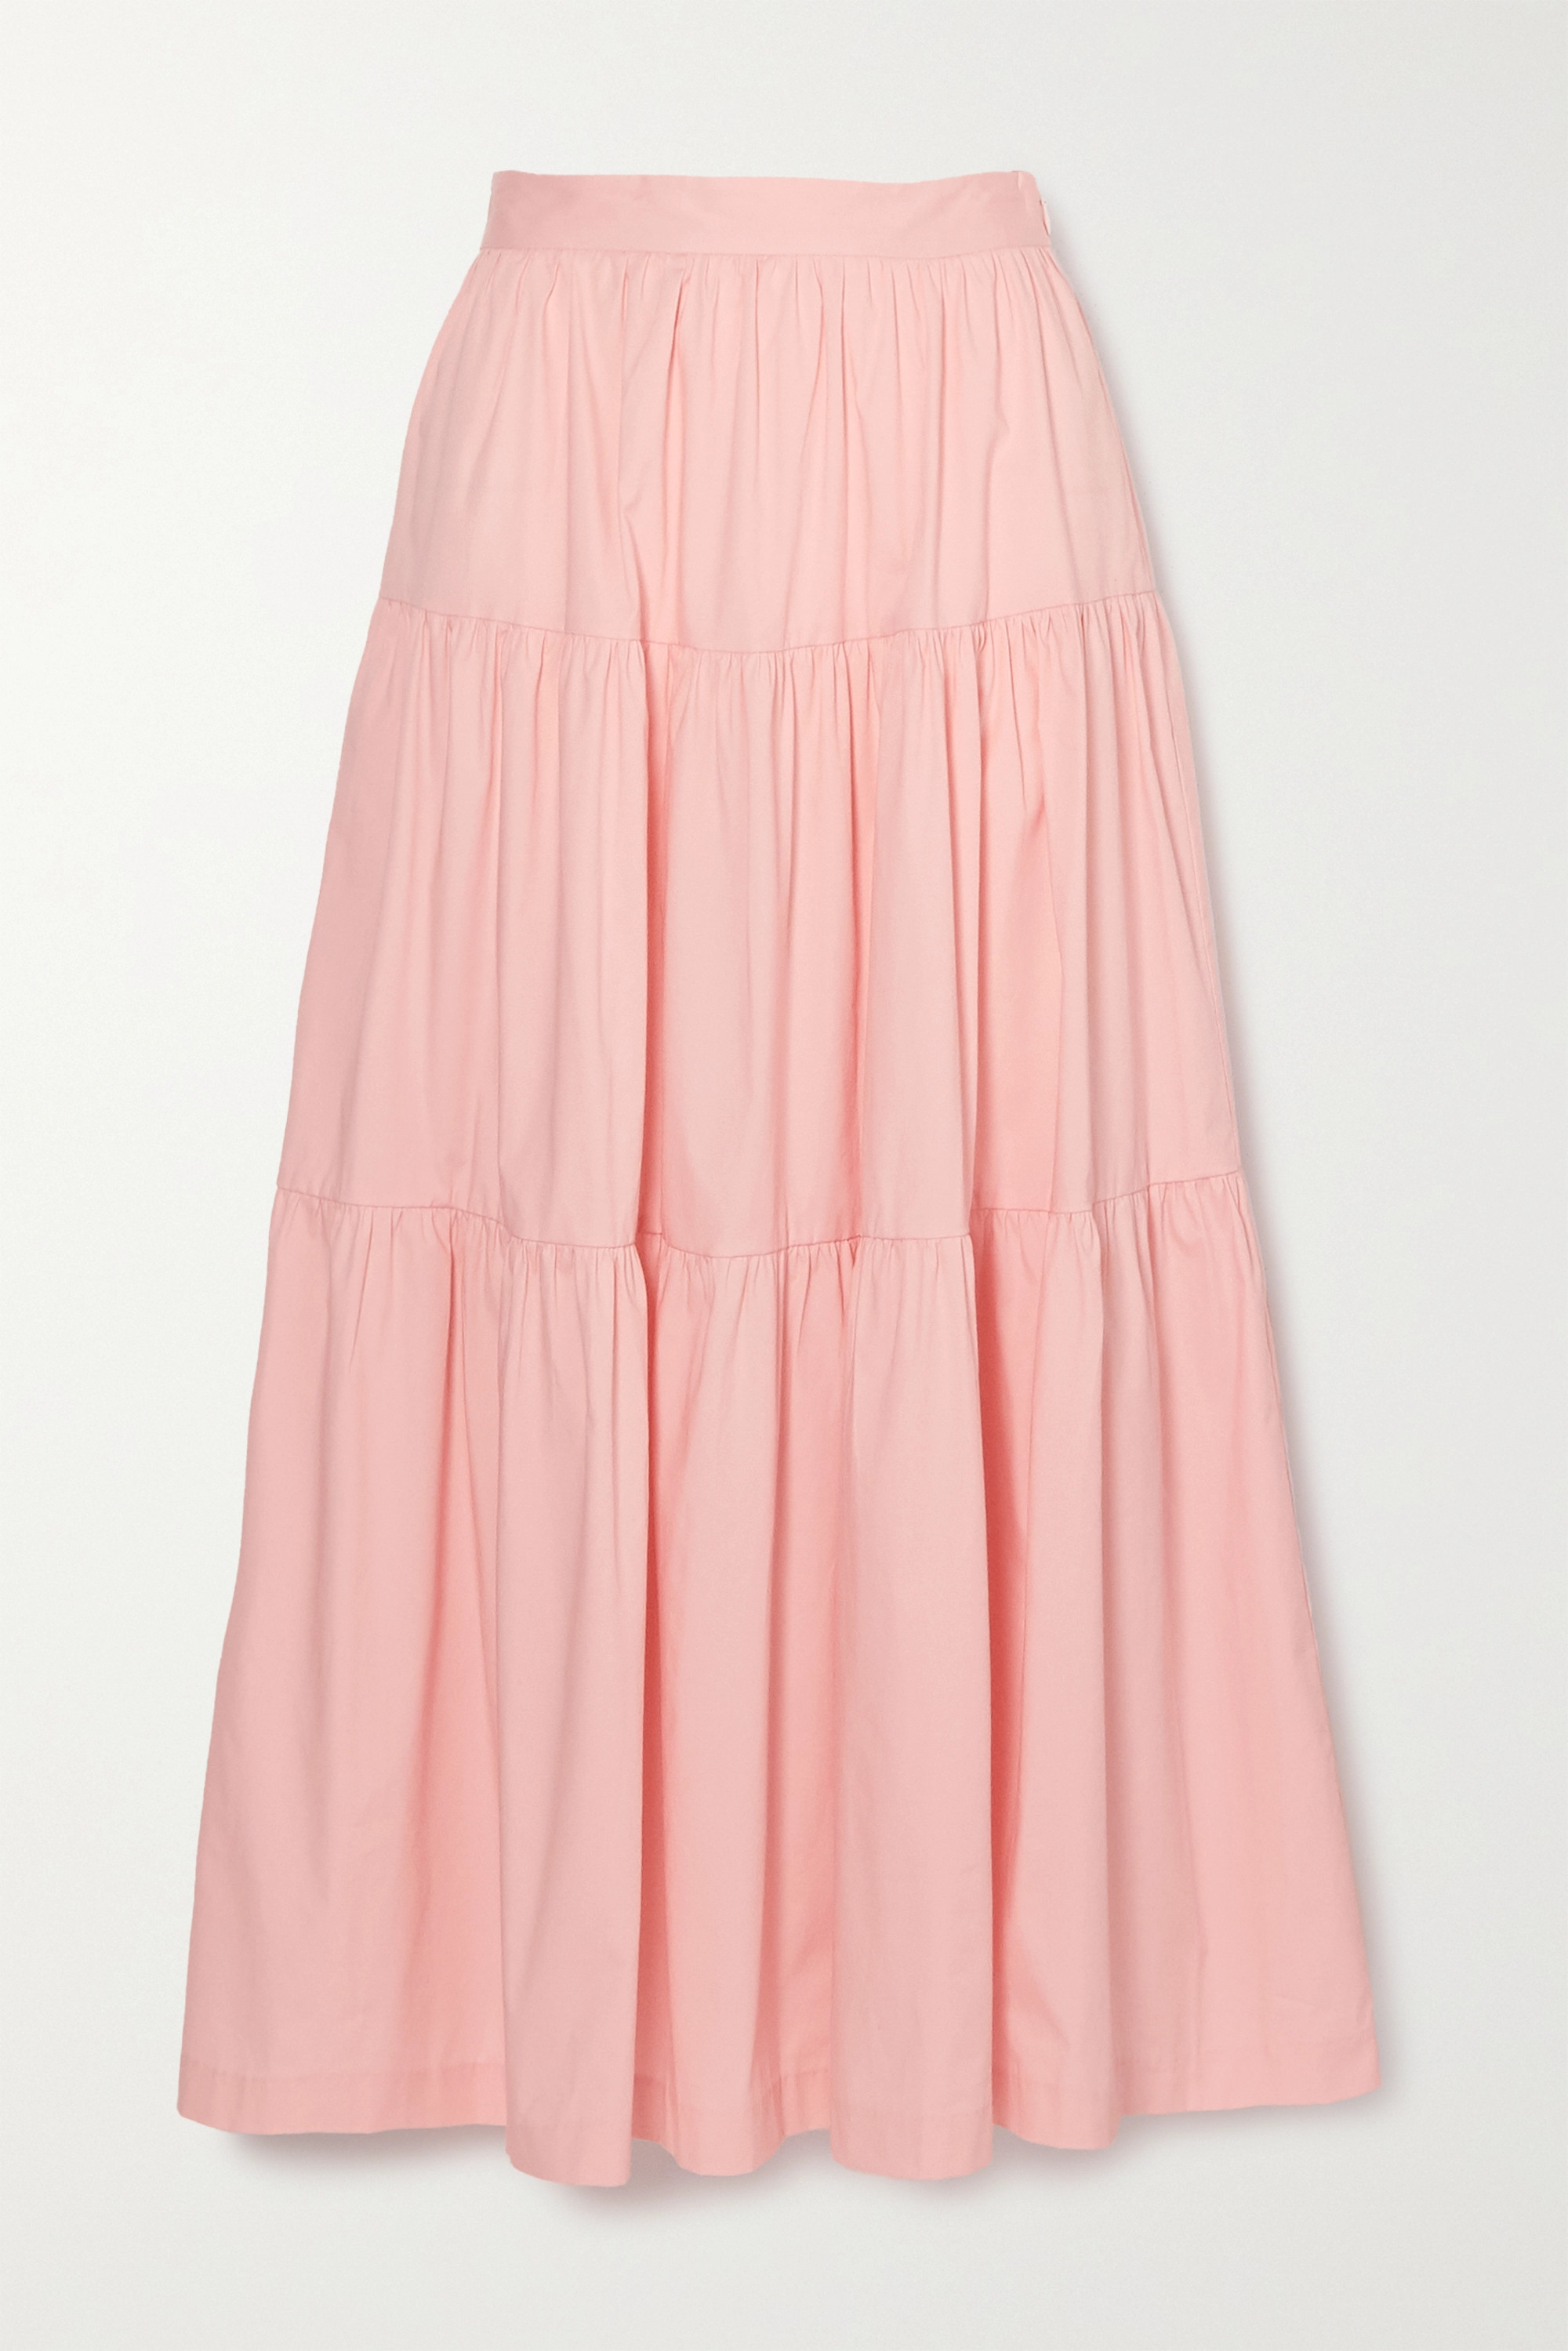 STAUD Sea tiered stretch-cotton poplin maxi skirt